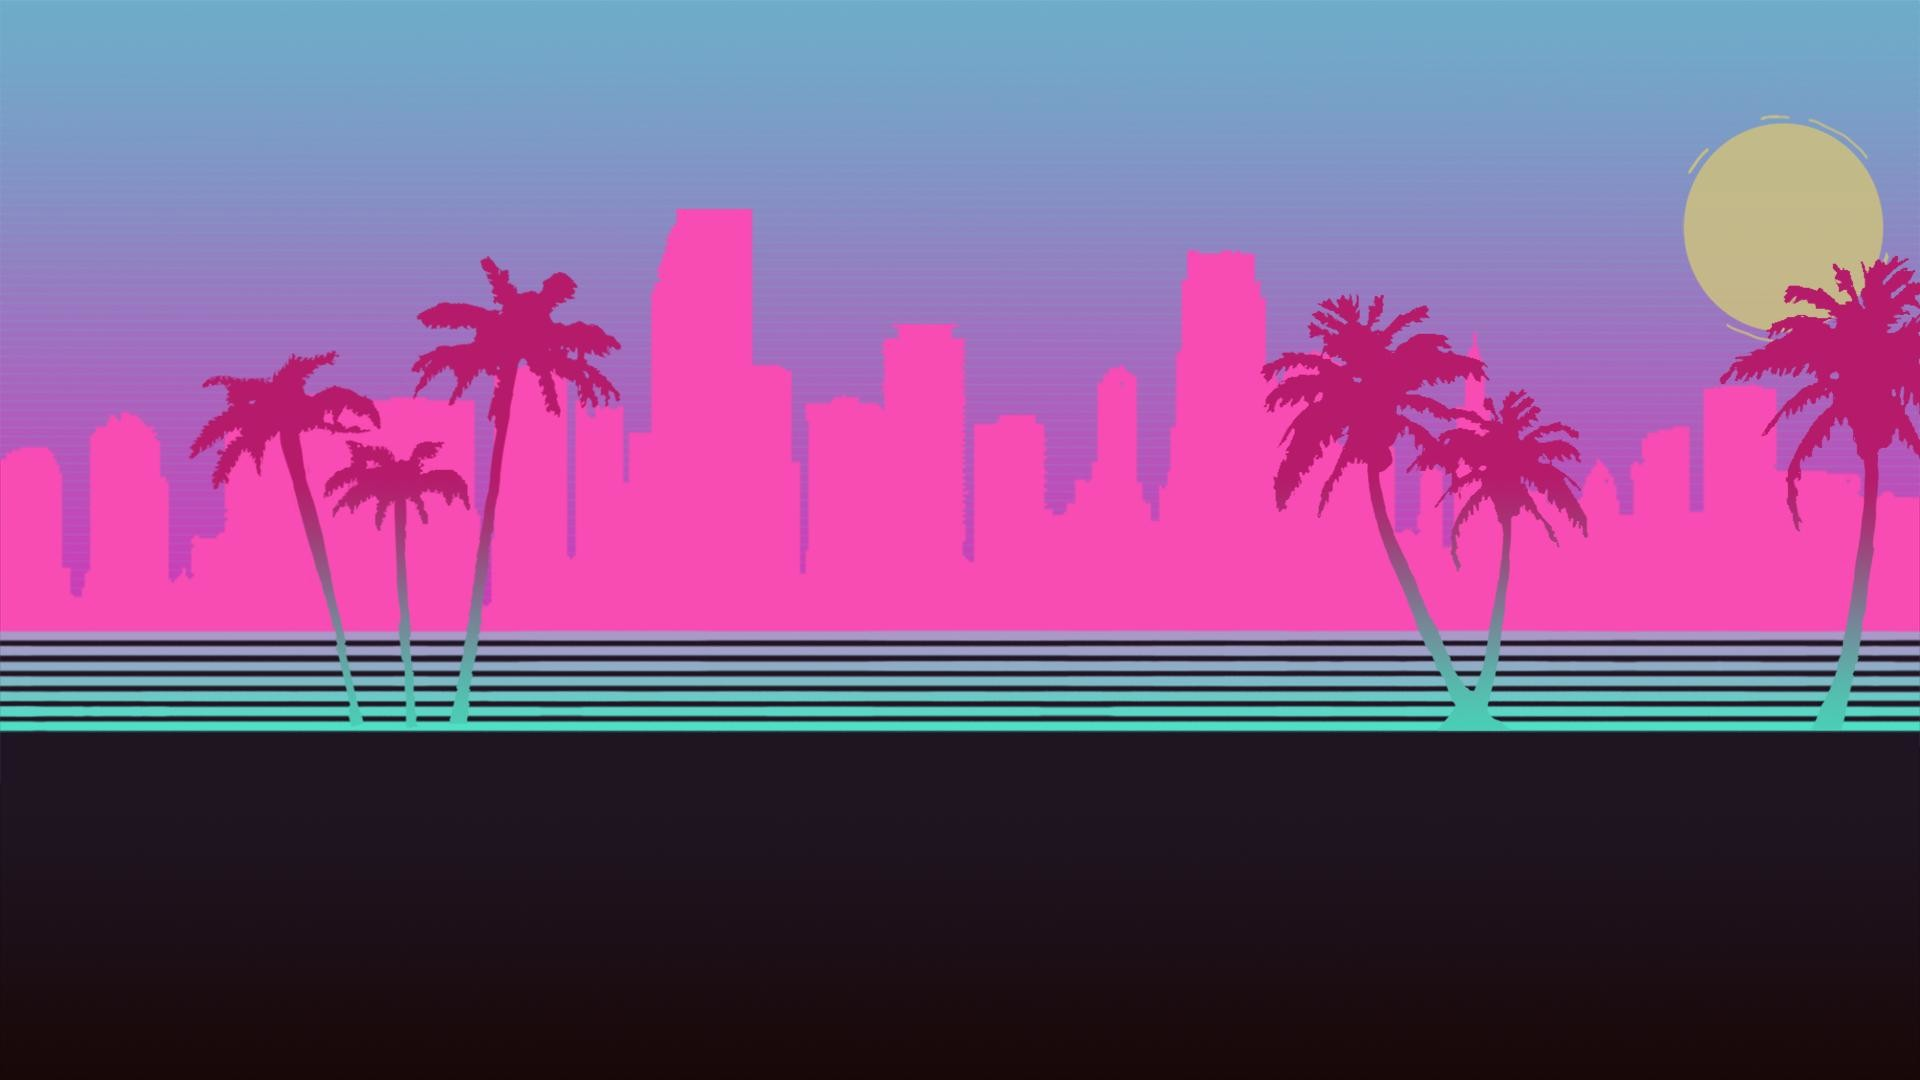 Hotline Miami desktop background (1920×1080)